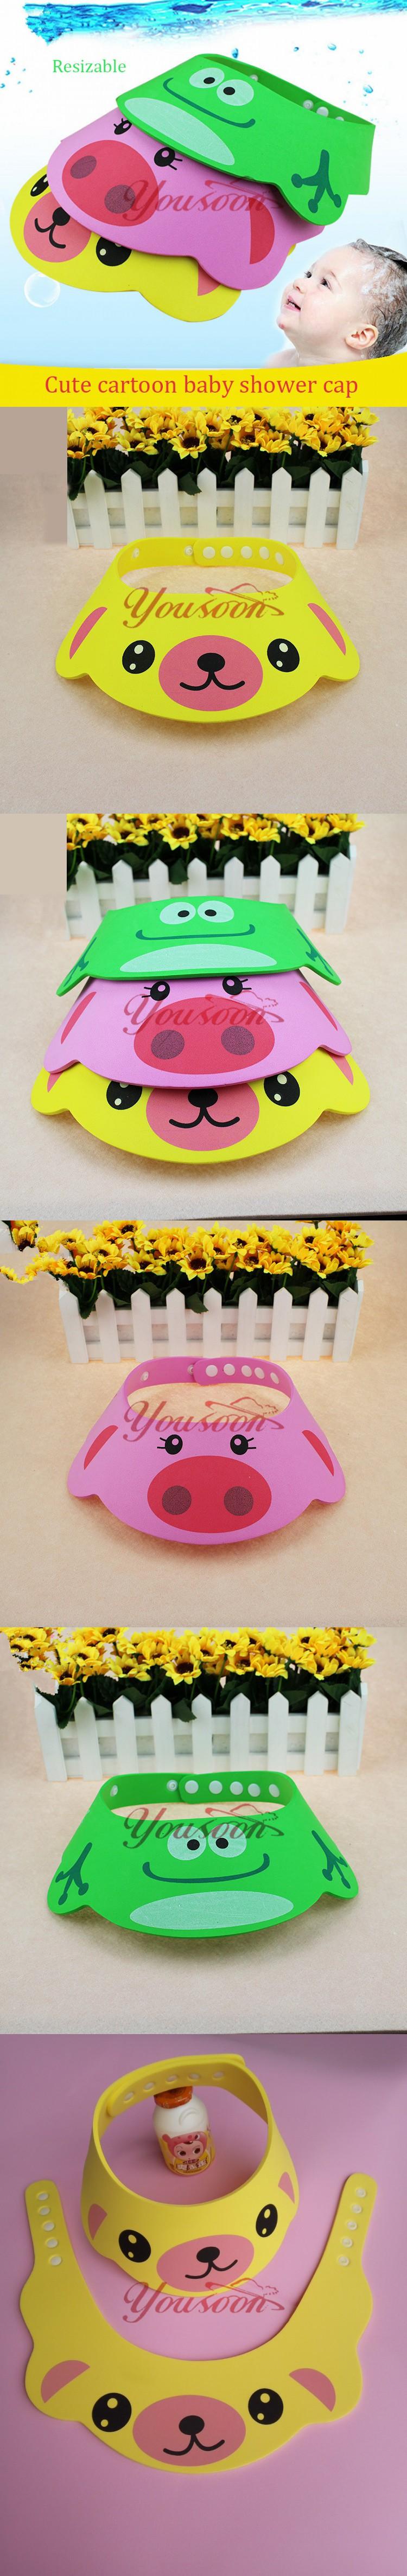 5 buttons Adjustable Baby Hat Toddler Kids Shampoo Bathing Shower